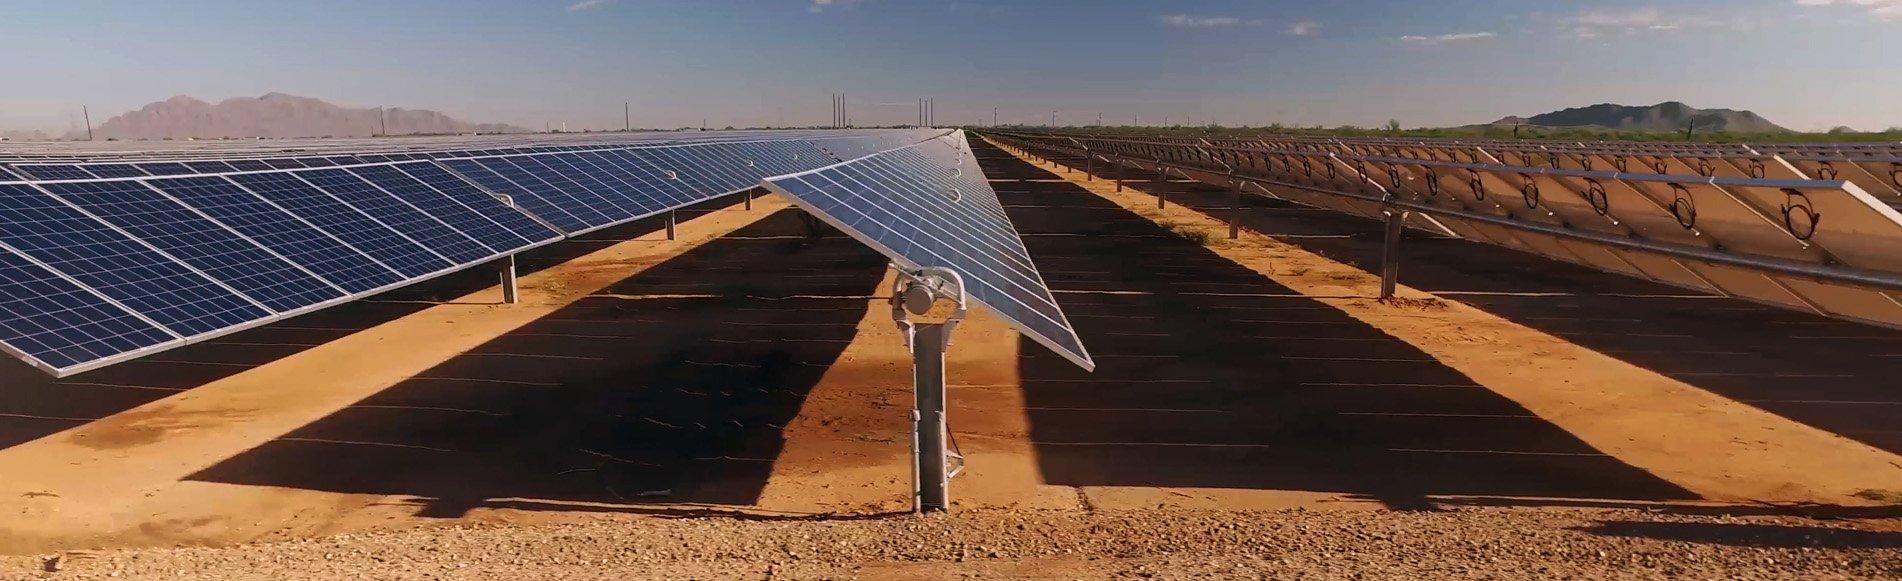 AUS Solar Farm Stock Image